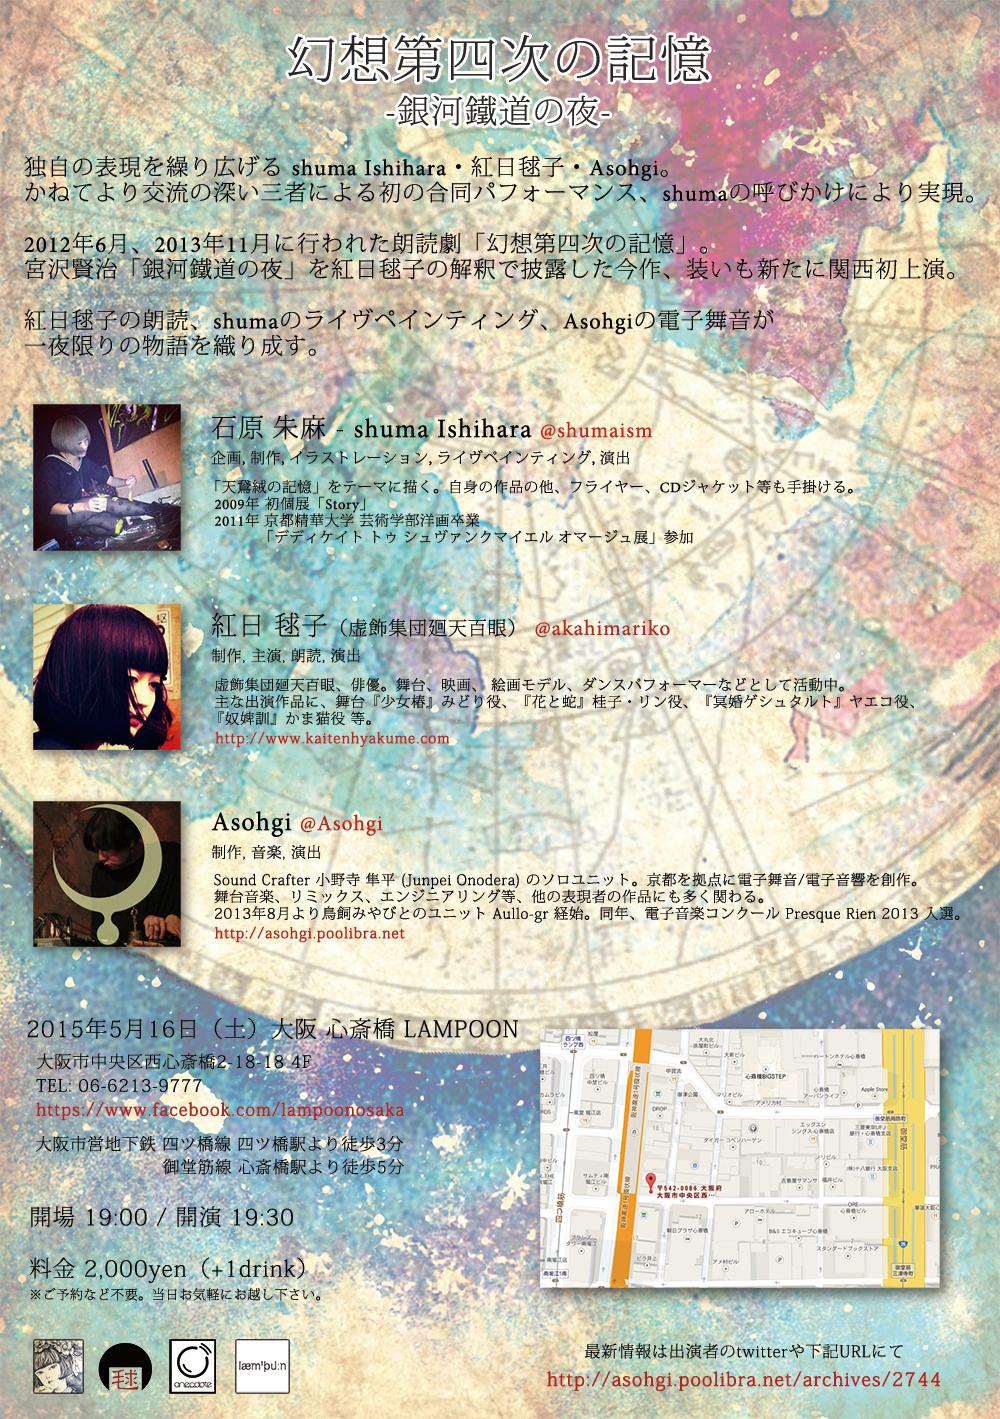 Photo: 幻想第四次の記憶 -銀河鐵道の夜-